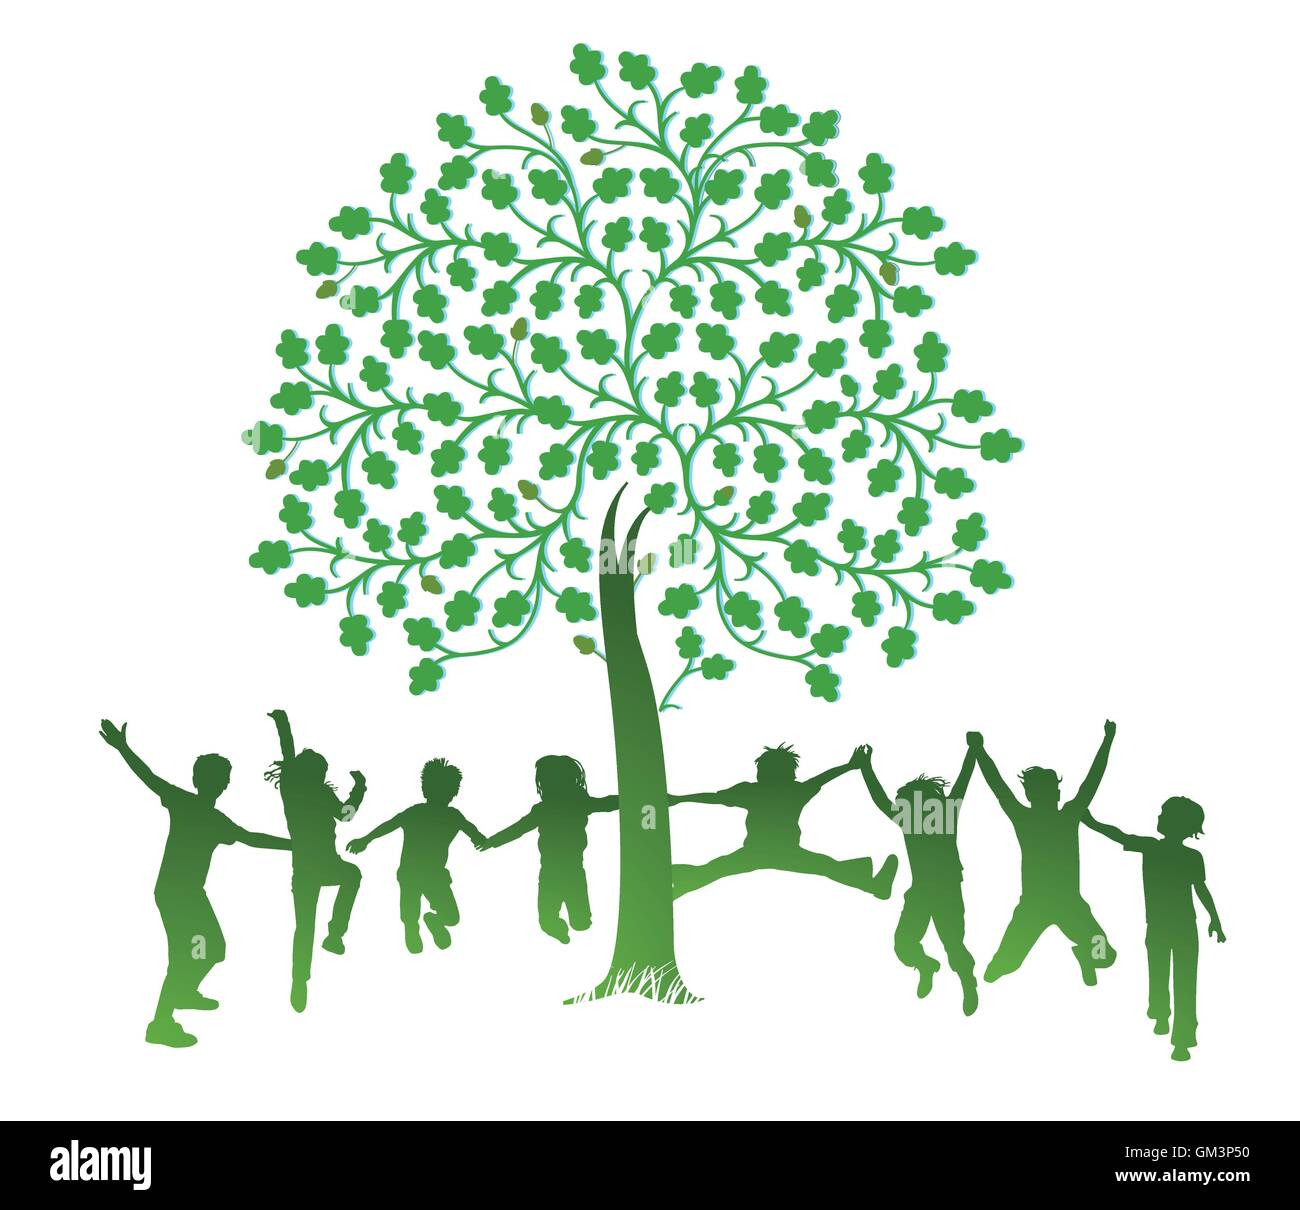 Children jump around a tree - Stock Vector